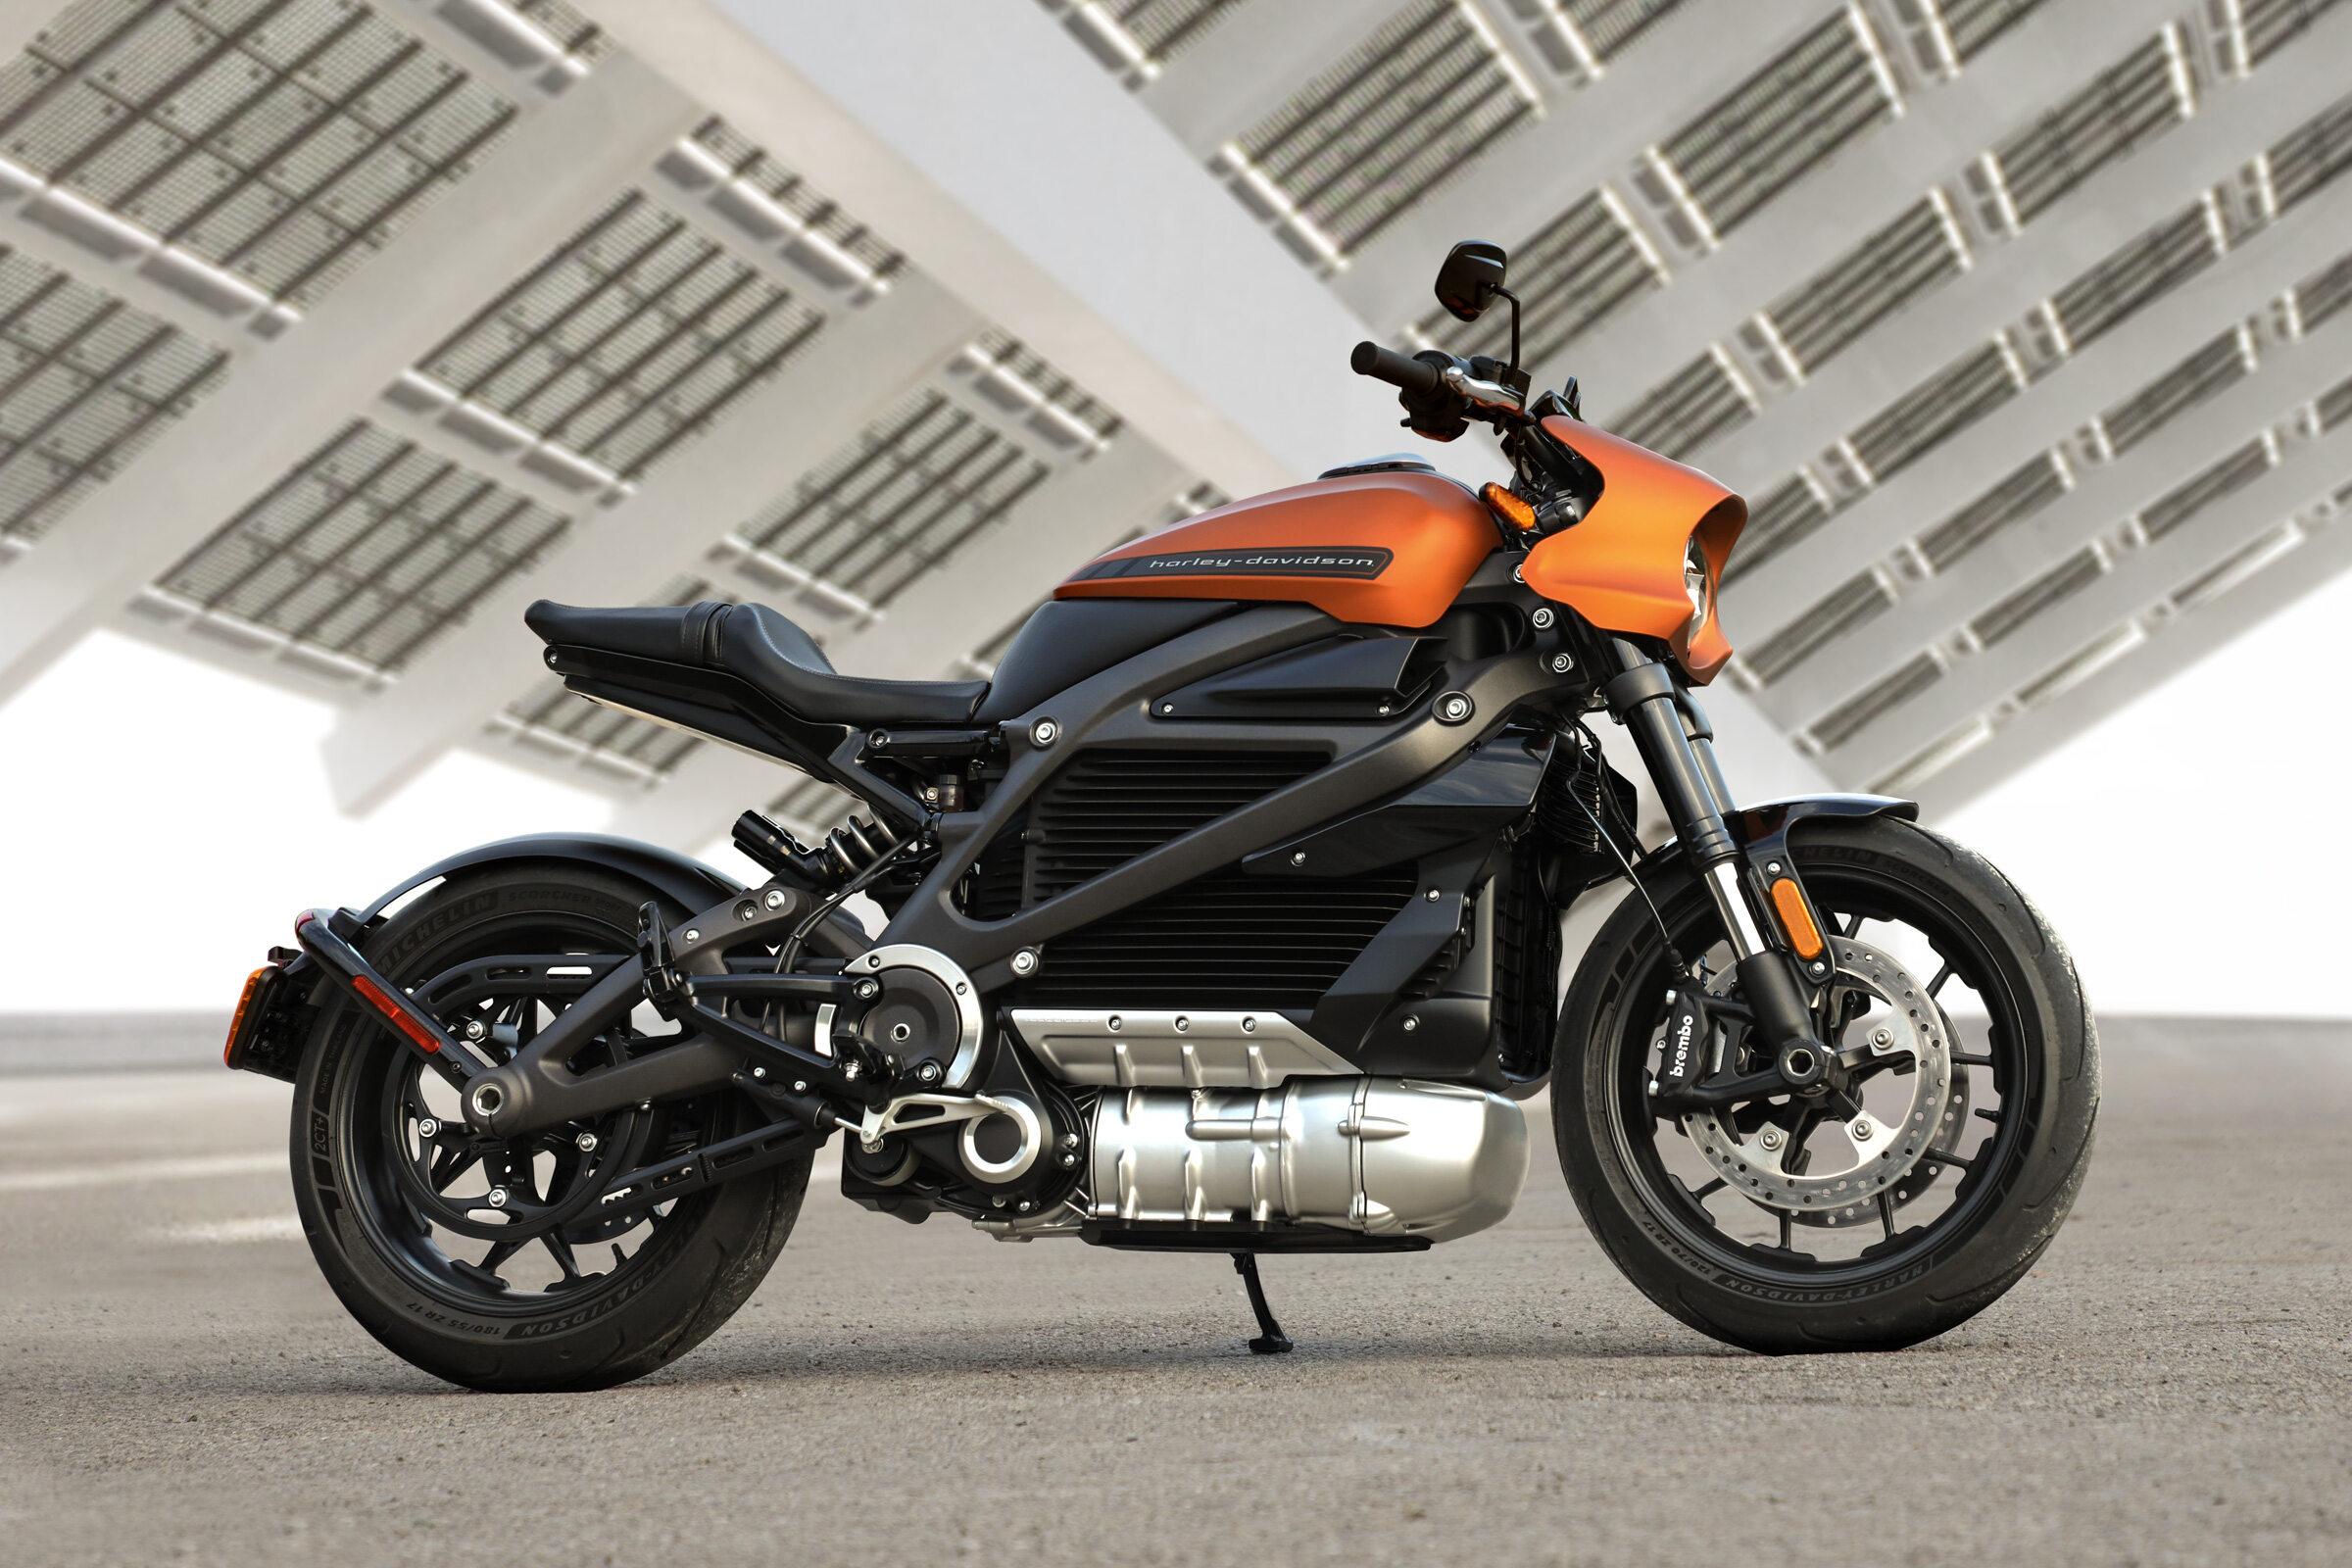 Harley-Davidson LiveWire Nowy motocykl elektryczny Harley-Davidson LiveWire